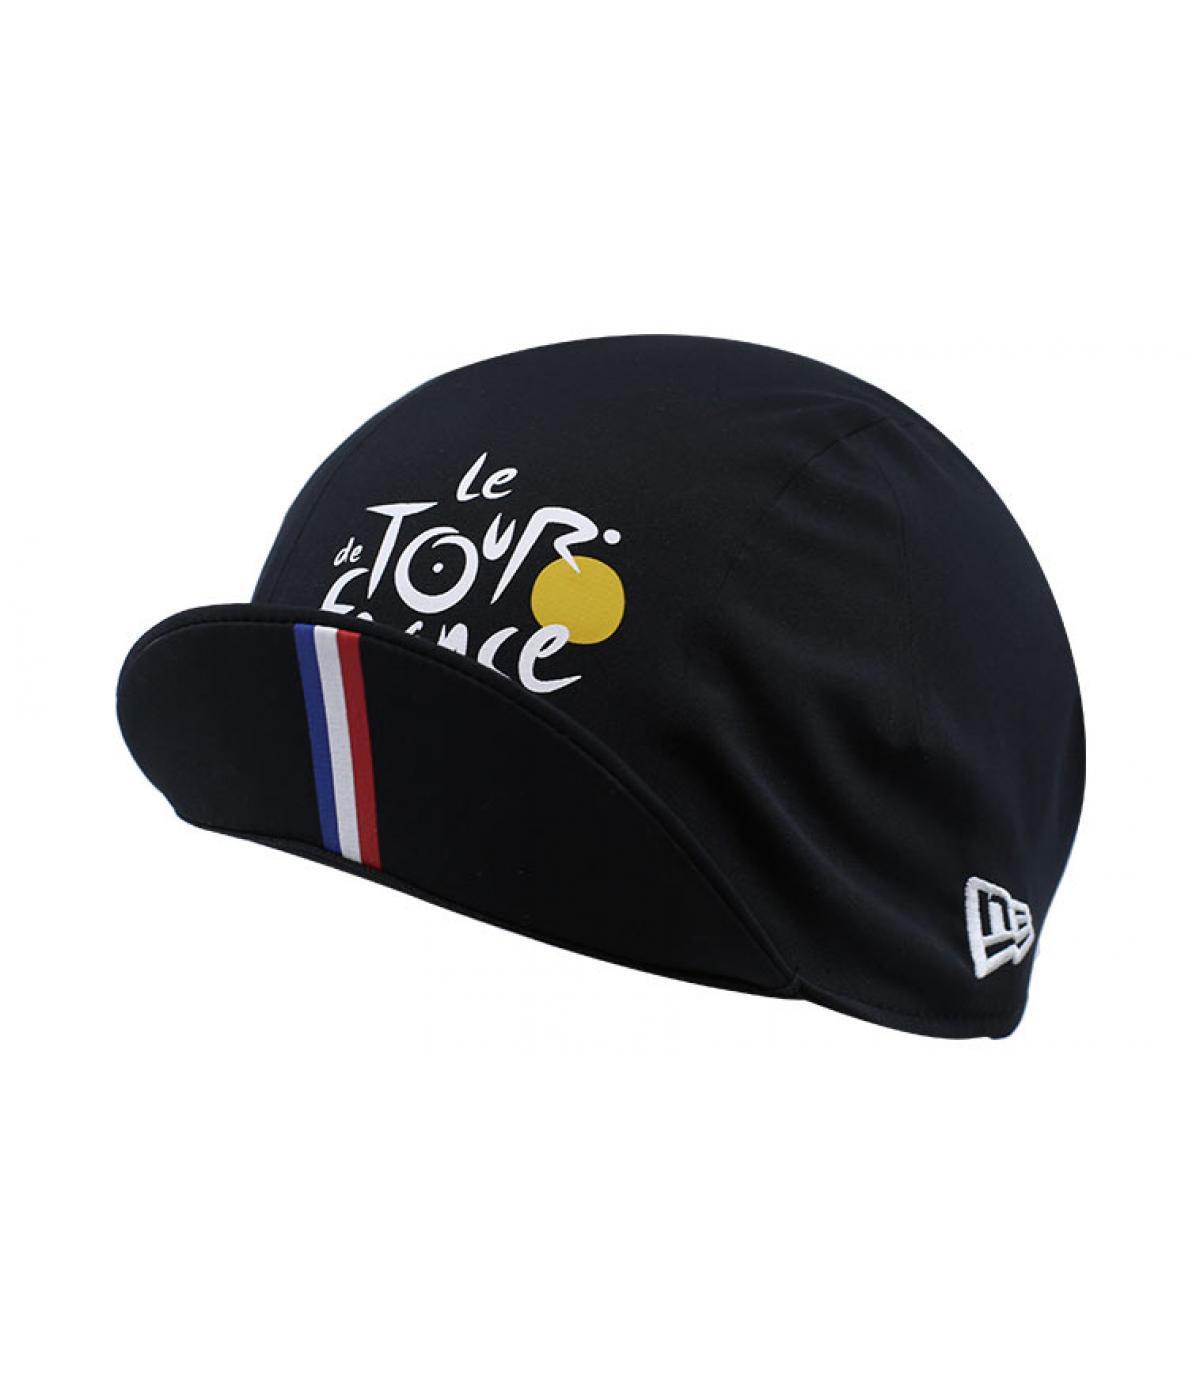 fietsdop Tour de France